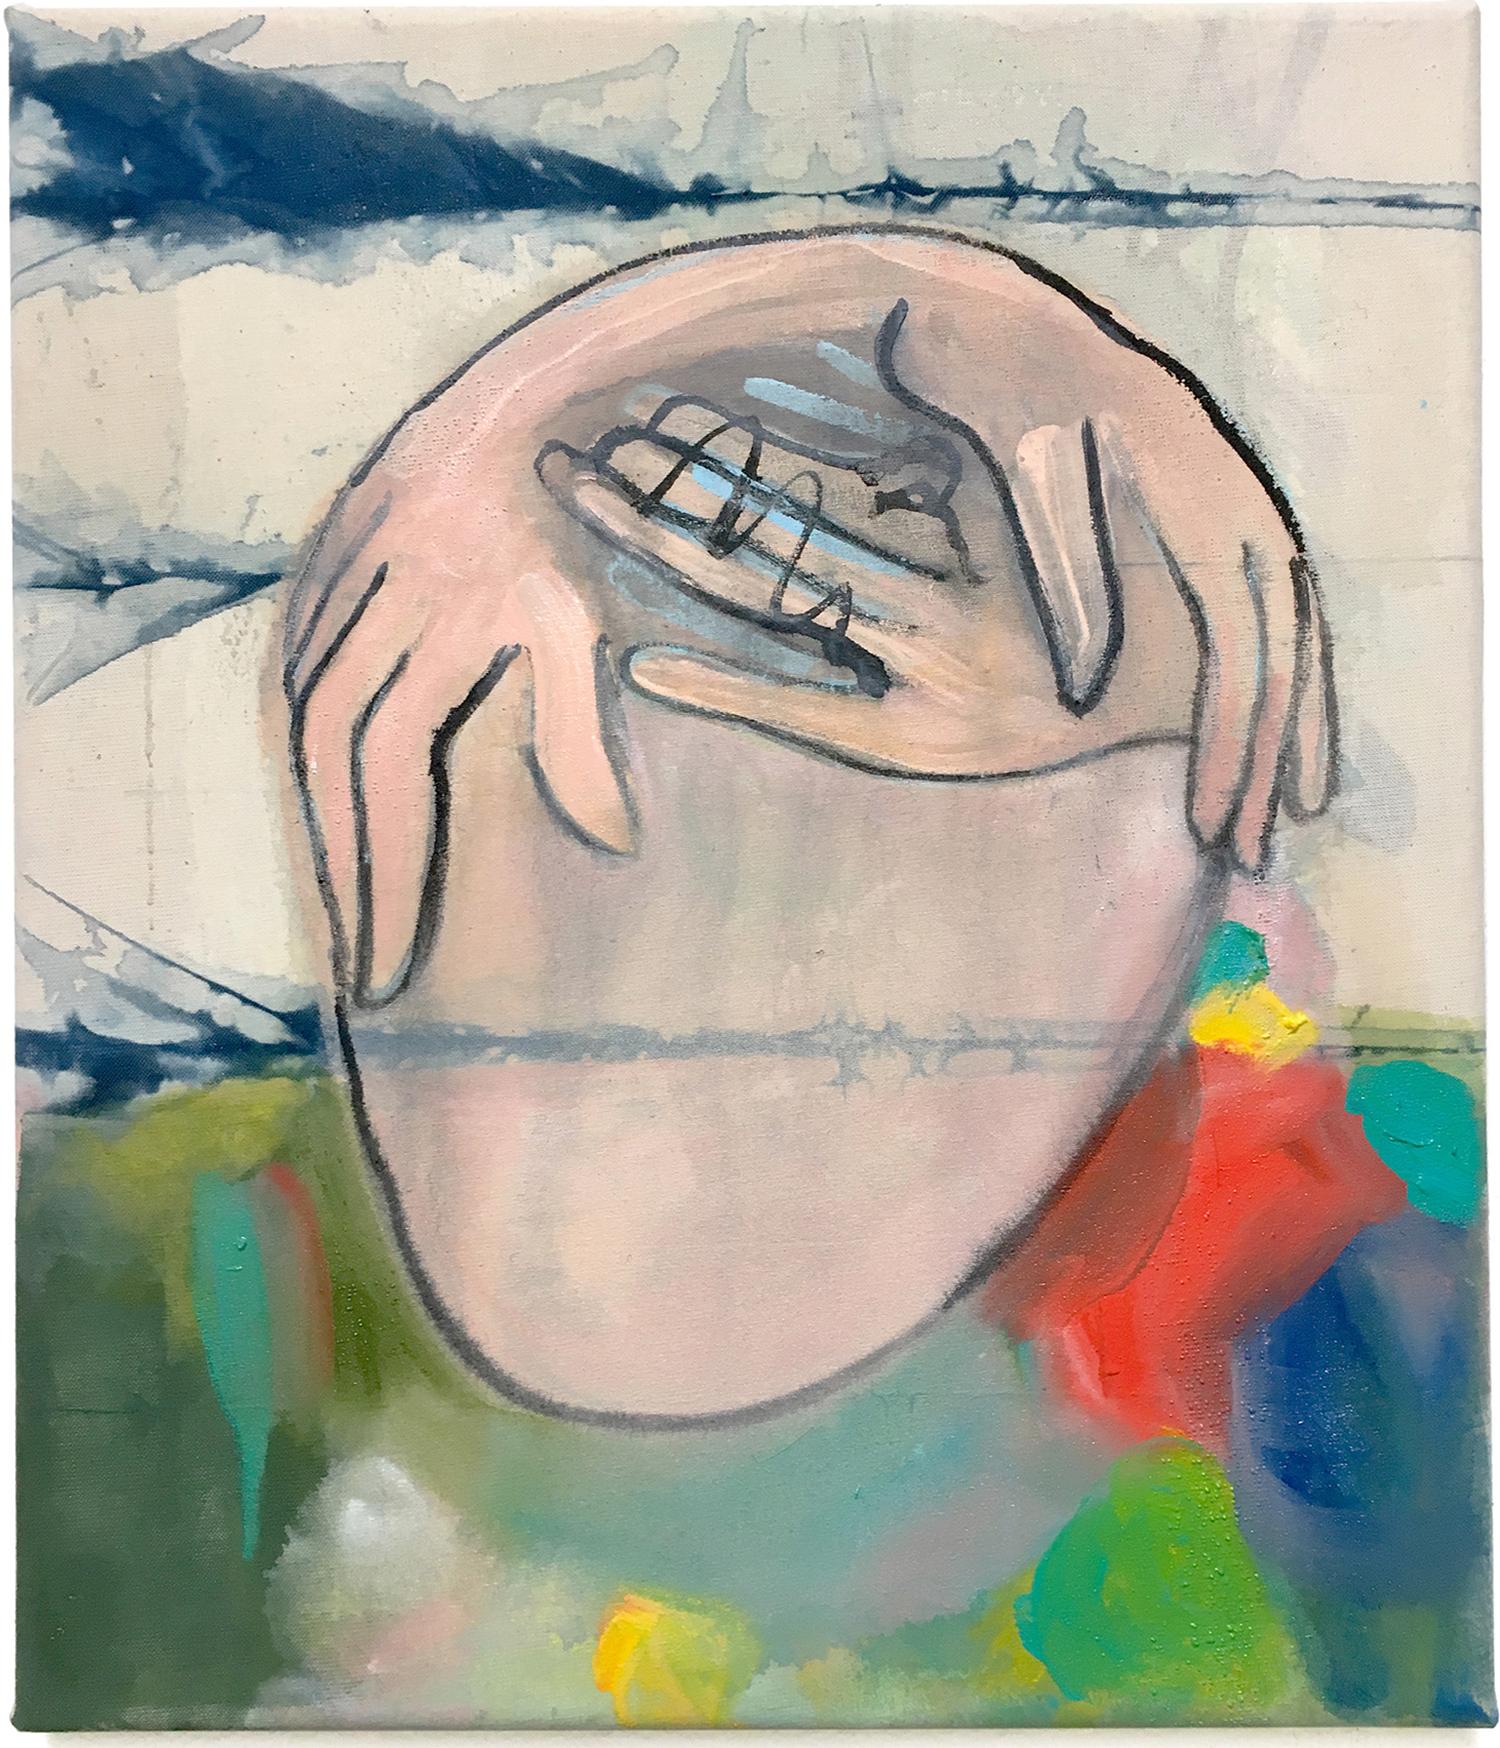 Nina-Tobien-painting-contemporary-art-body-fragmented-surreal-skin-face-hands-deformed-new-bodies-guarded-colors-batik-dying-shibori-indigo-portrait